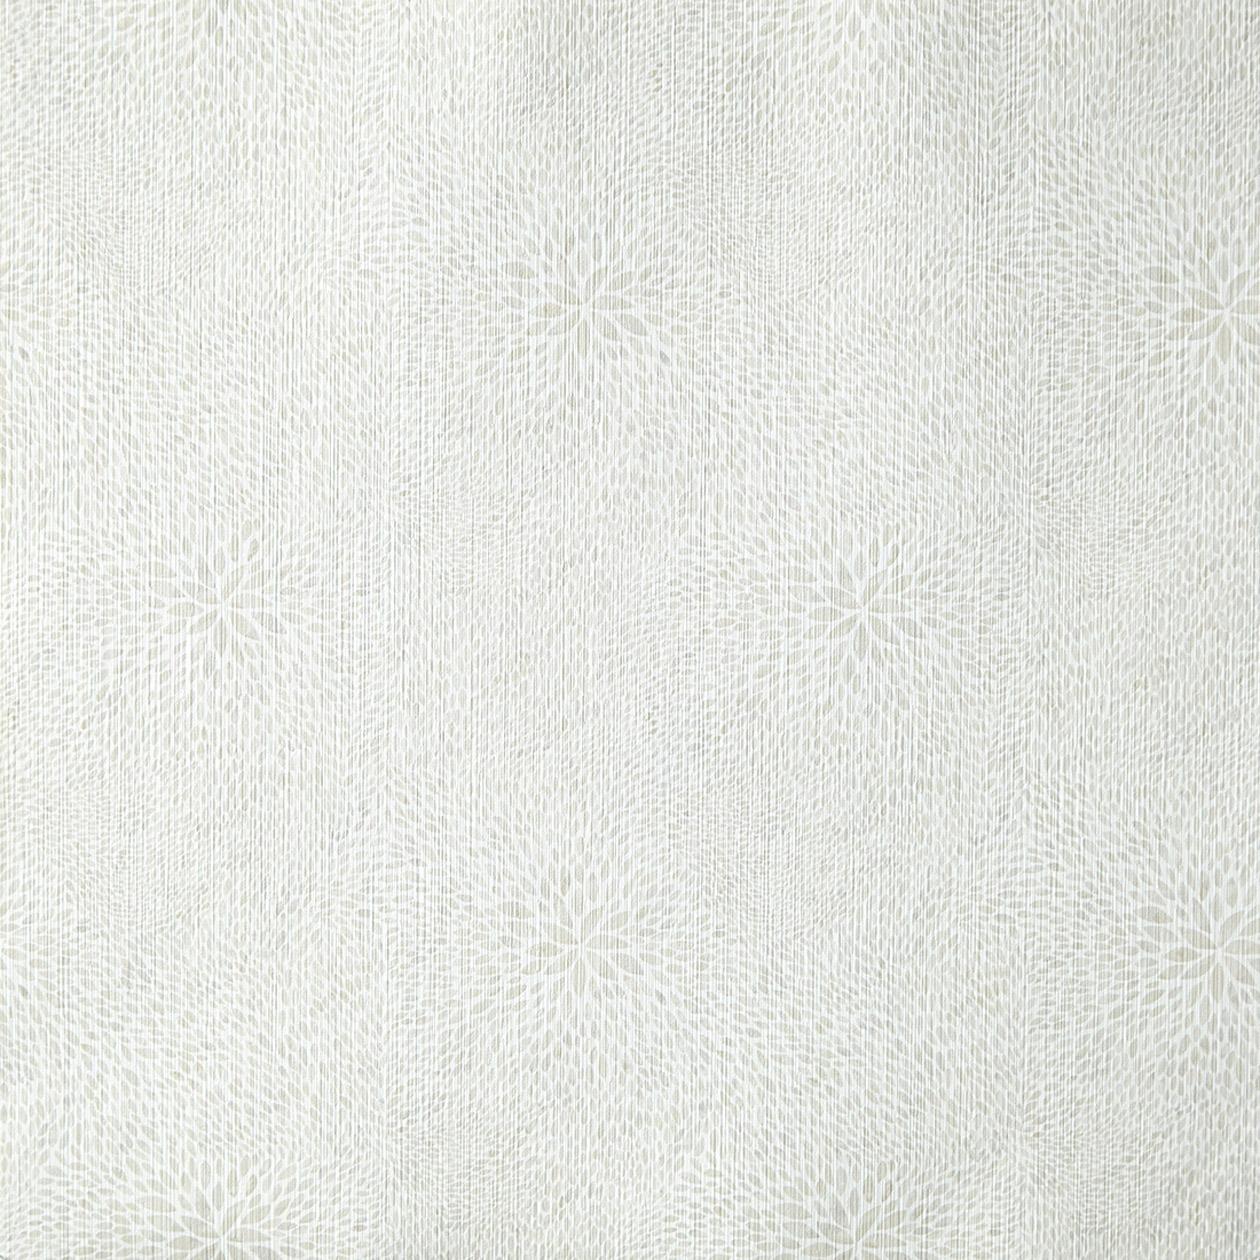 Французские обои Caselio,  коллекция Amazonia, артикулAMZ66461010